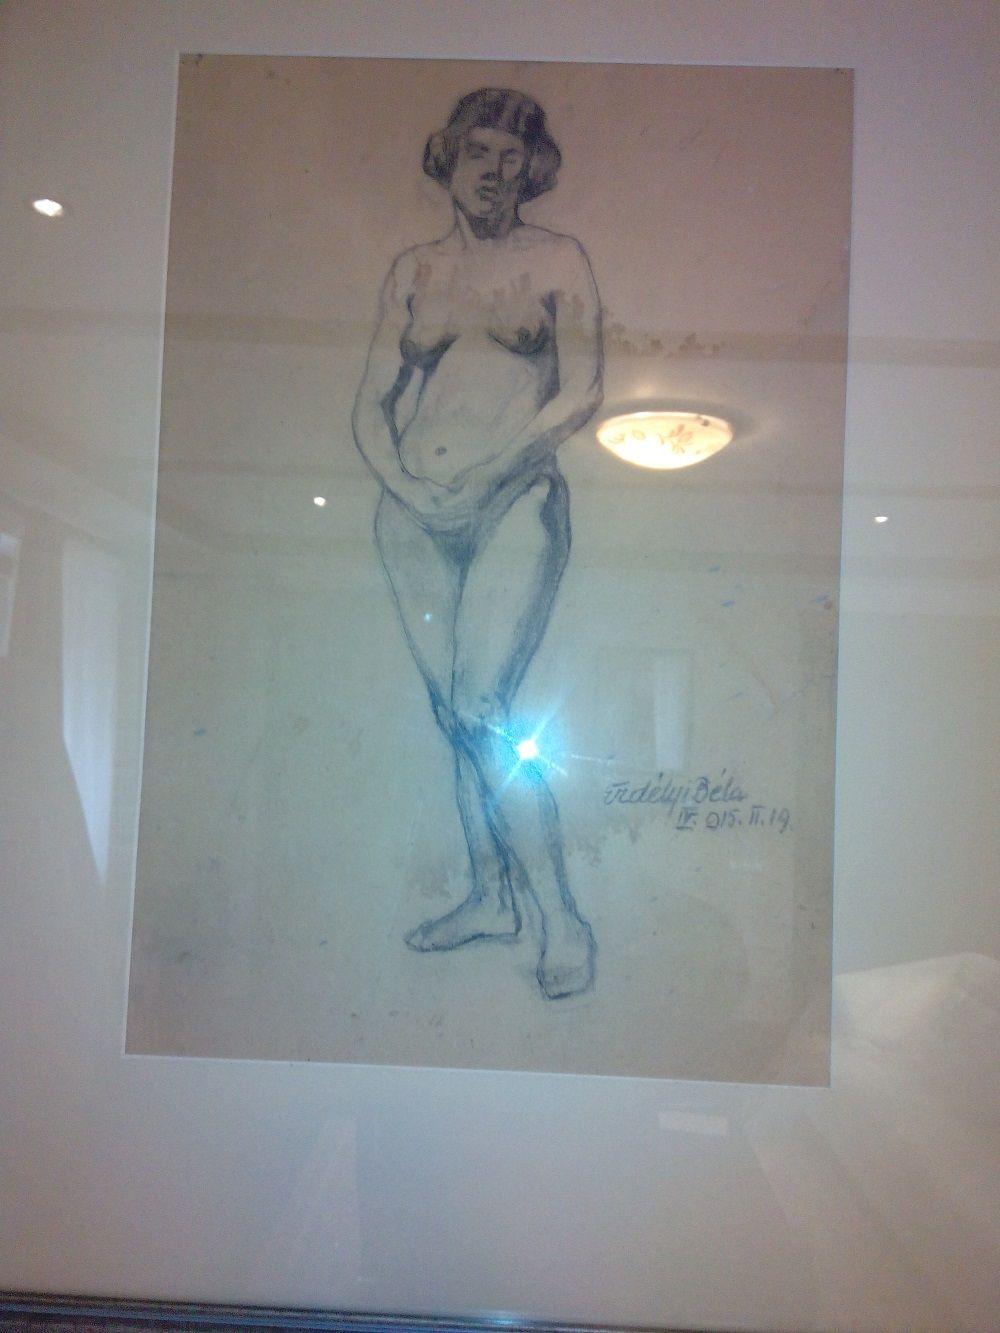 Картинная галерея усадьбы Медведчука напоминает музей